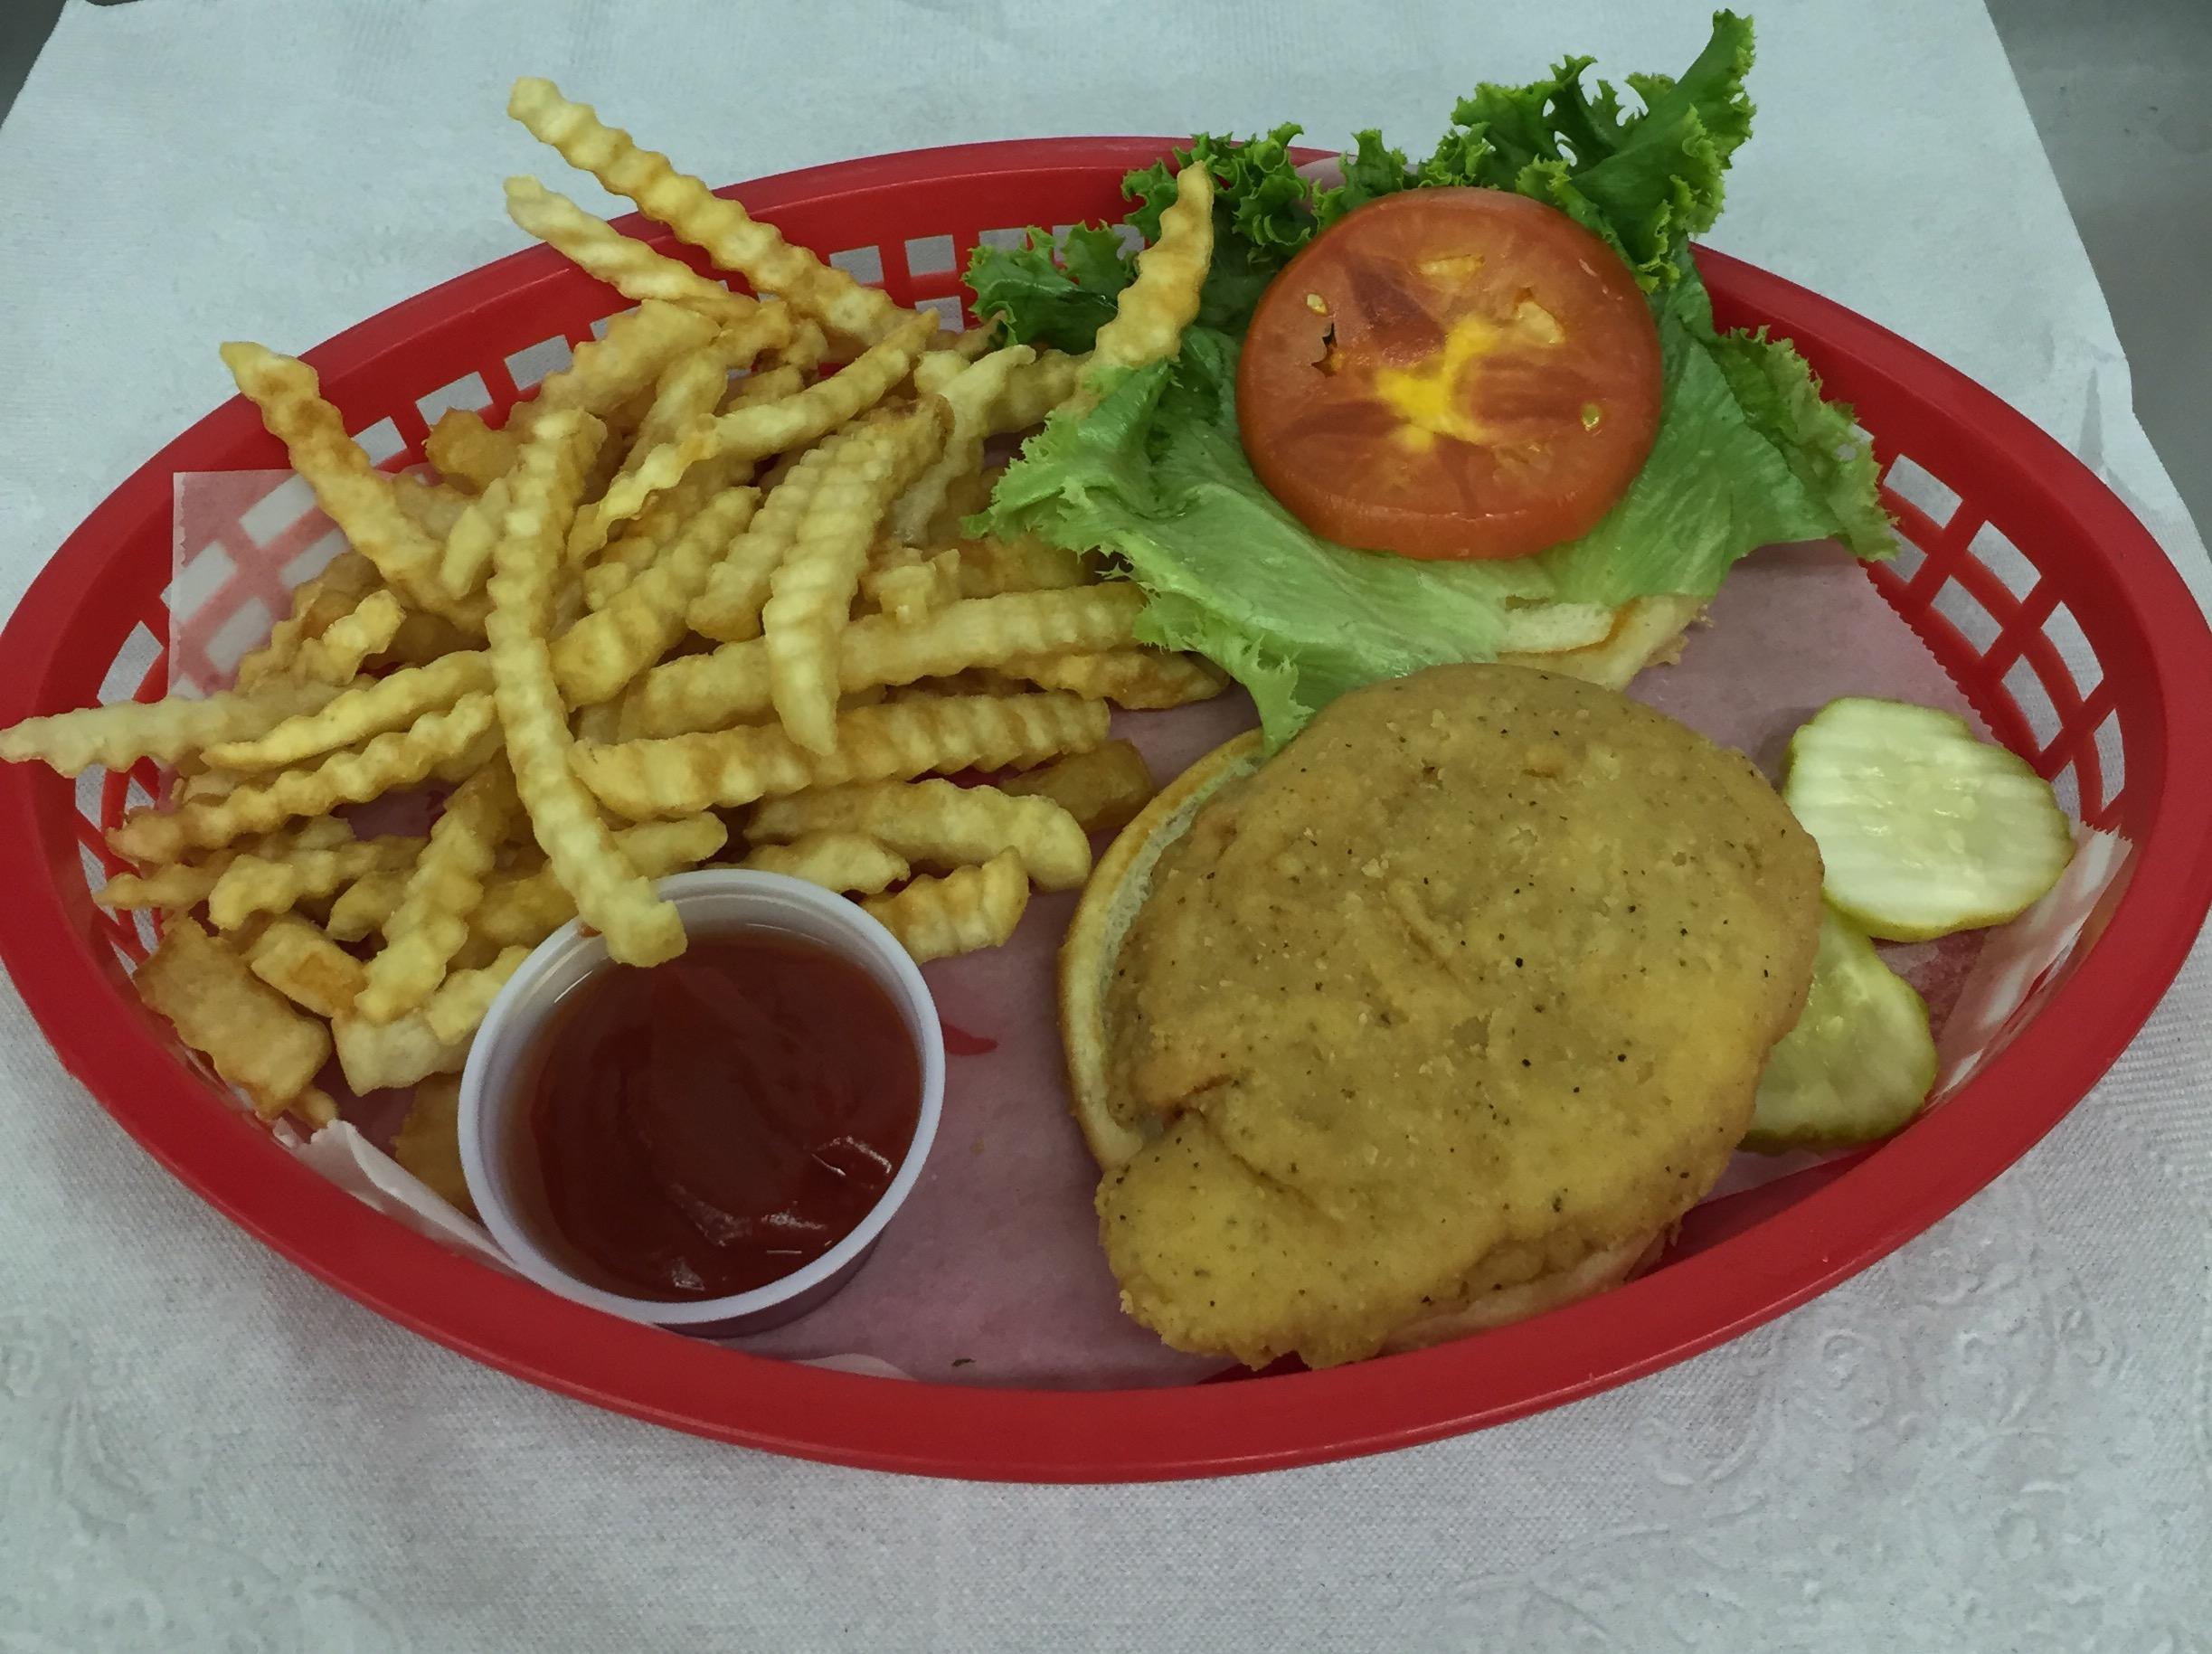 $6 M-F Lunch Special 11-3pm BURGER, CHICKEN FILLET BASKETS